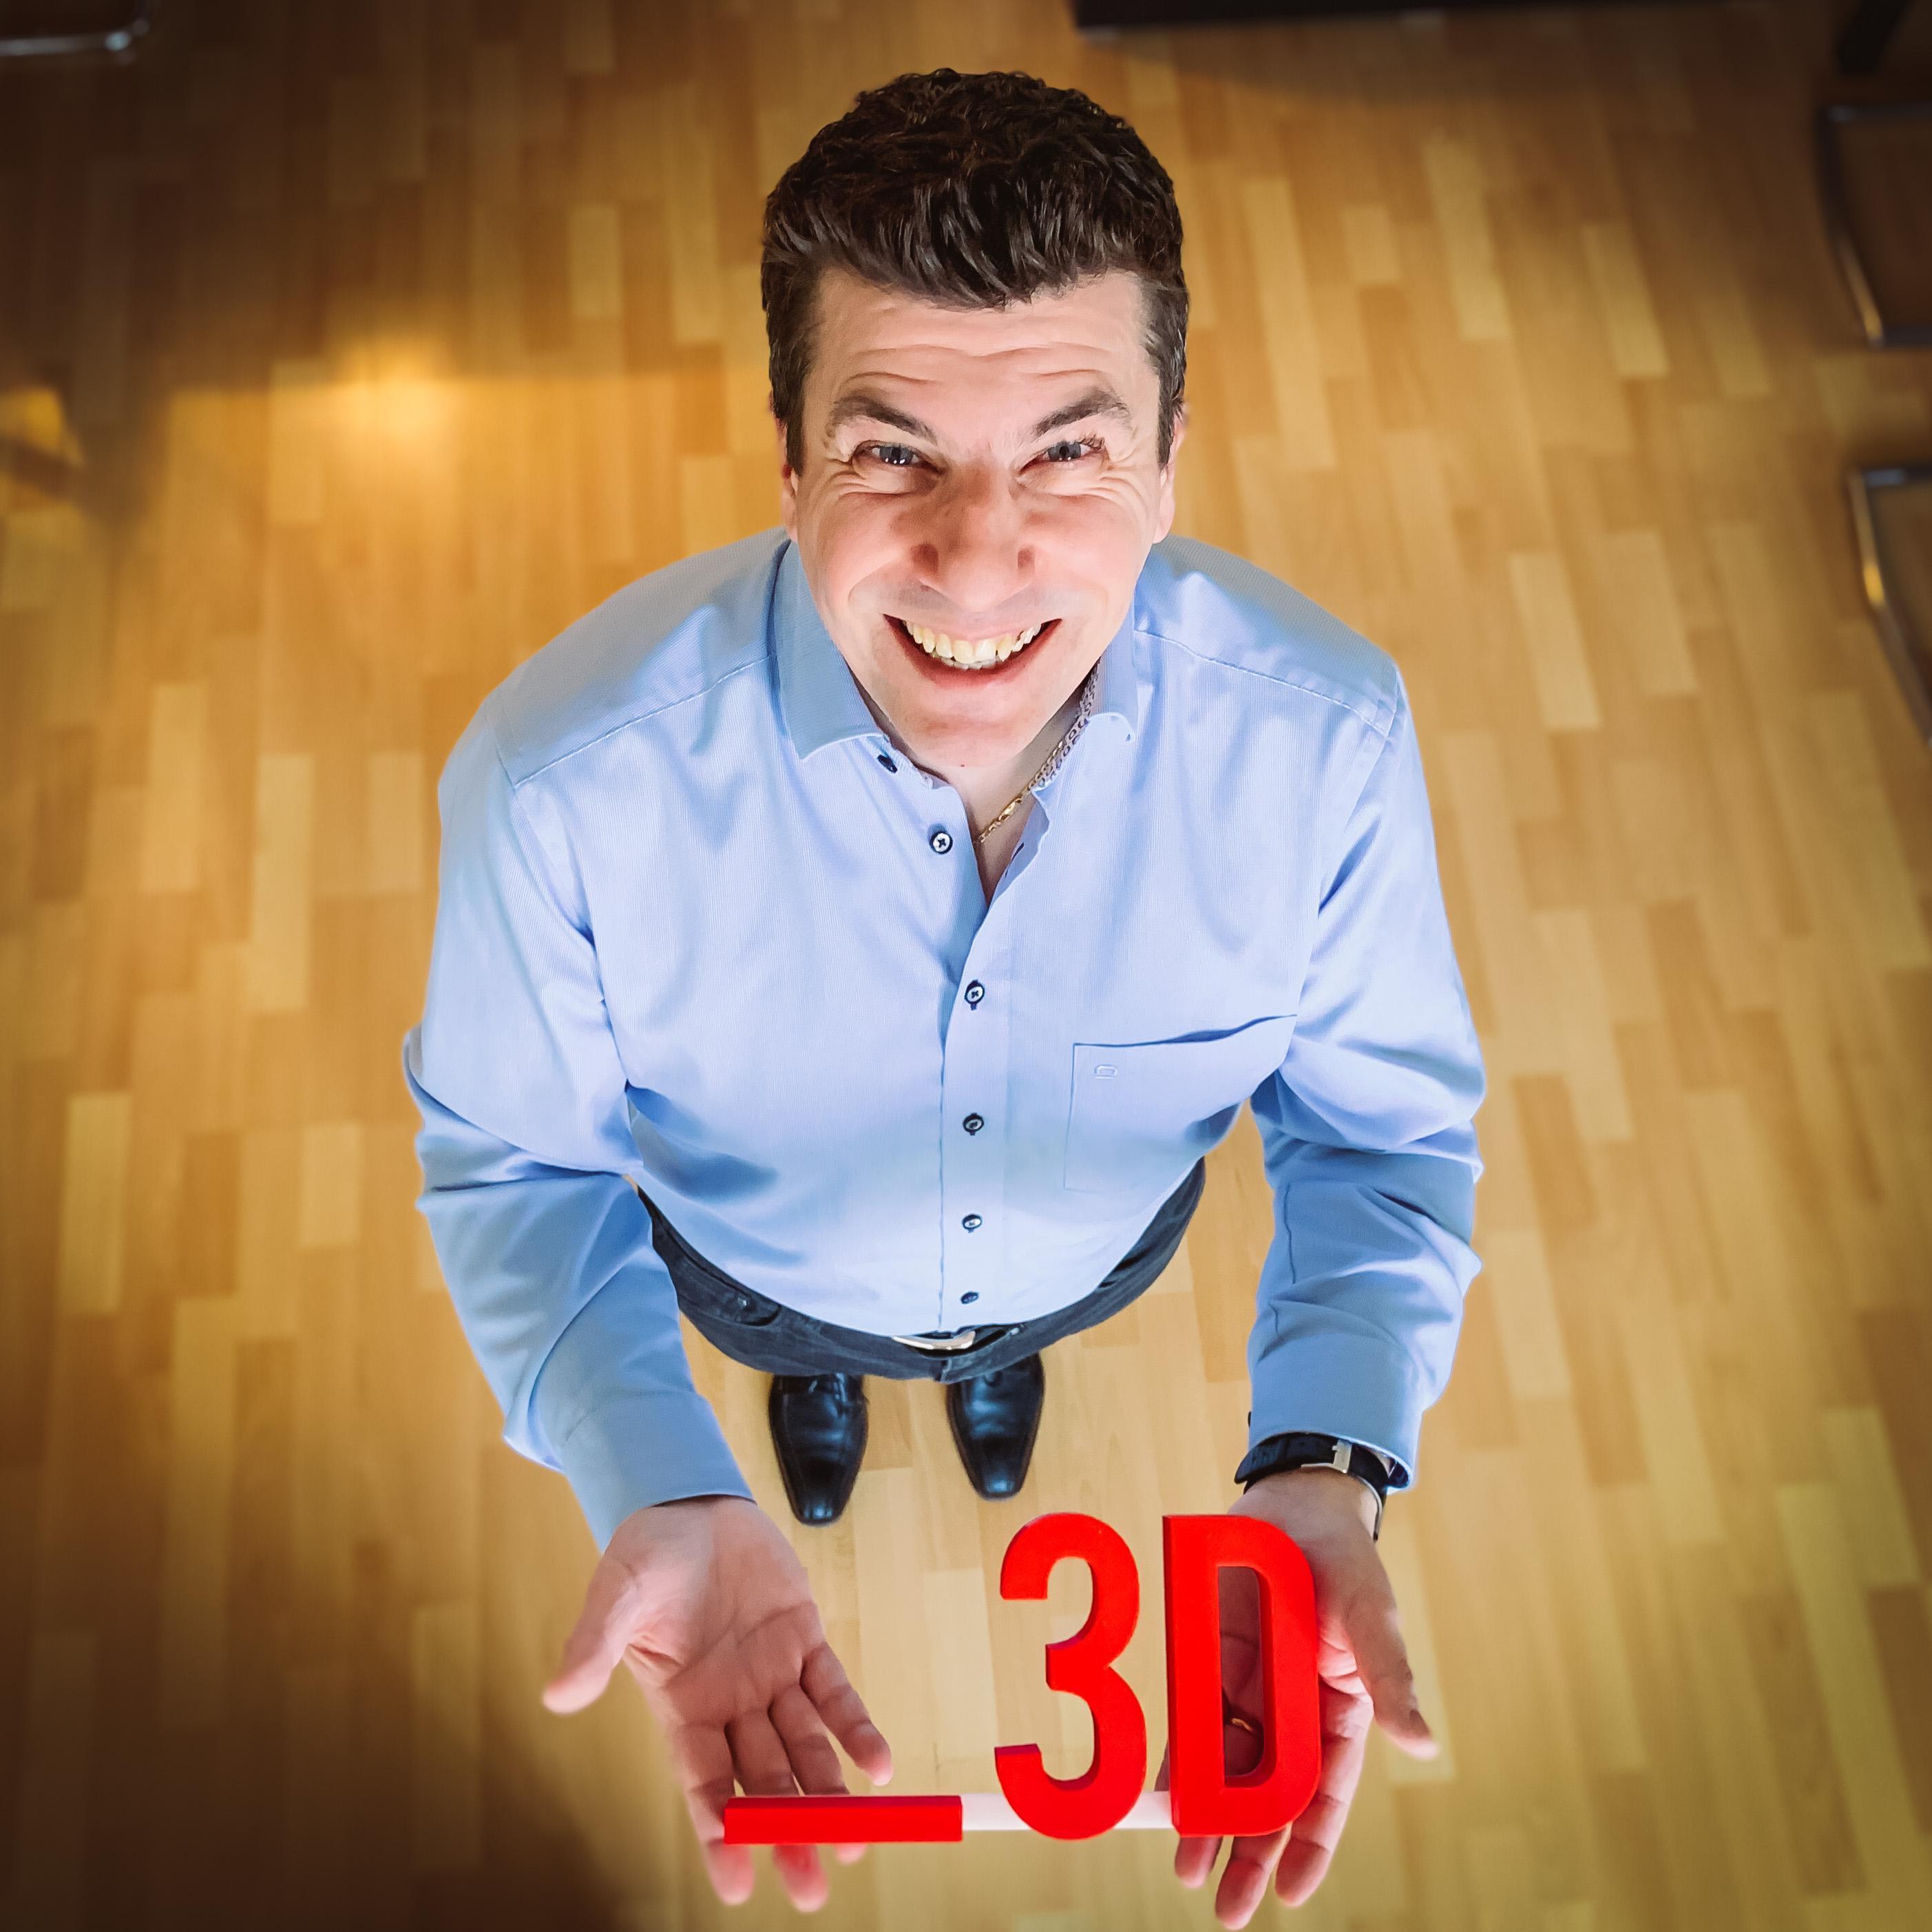 ICE CREAM MACHINE - 3D PRINTED